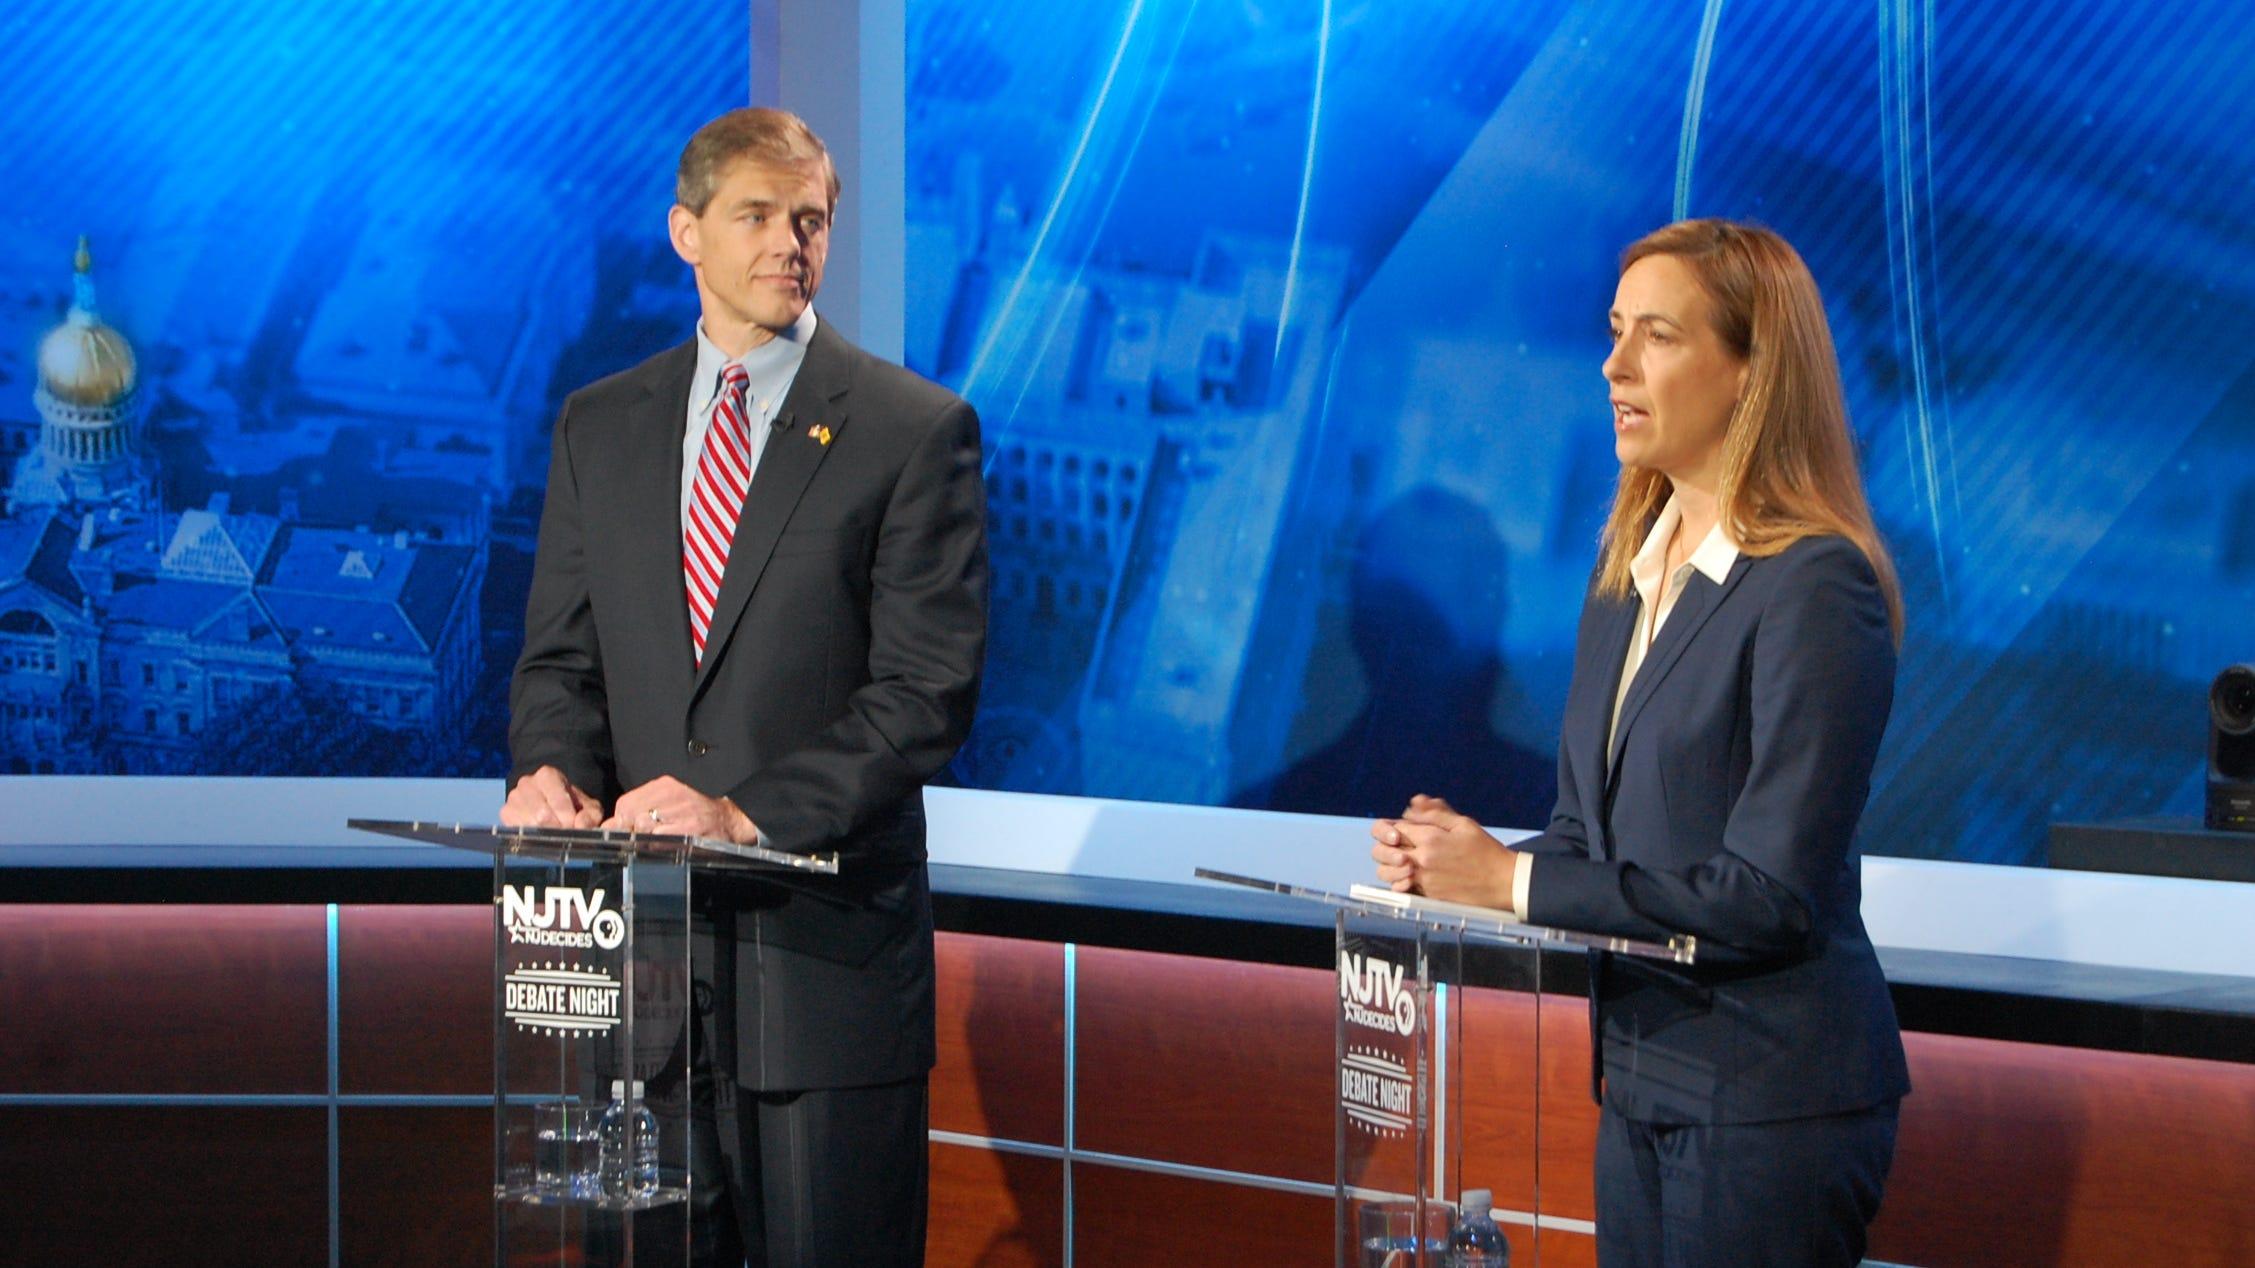 Mikie Sherrill-Jay Webber CD-11 NJTV Debate at the Agnes Varis NJTV Studio in Newark, NJ on October 10, 2018